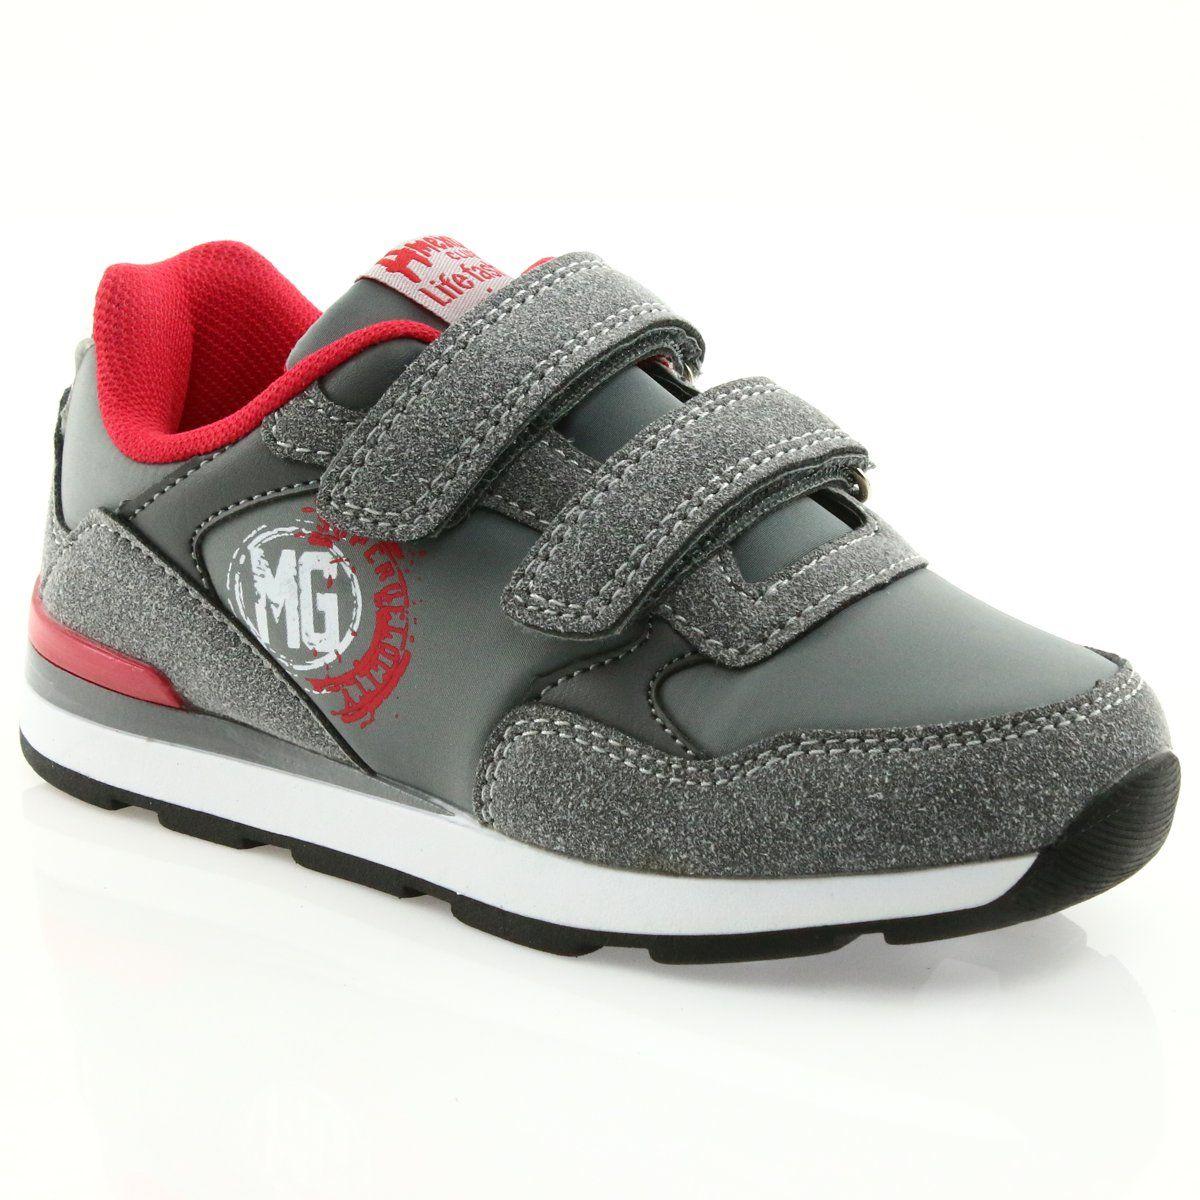 American Club Buty Sportowe Wkladka Skorzana American Bs08 Szare Czerwone New Balance Sneaker Dc Sneaker Shoes